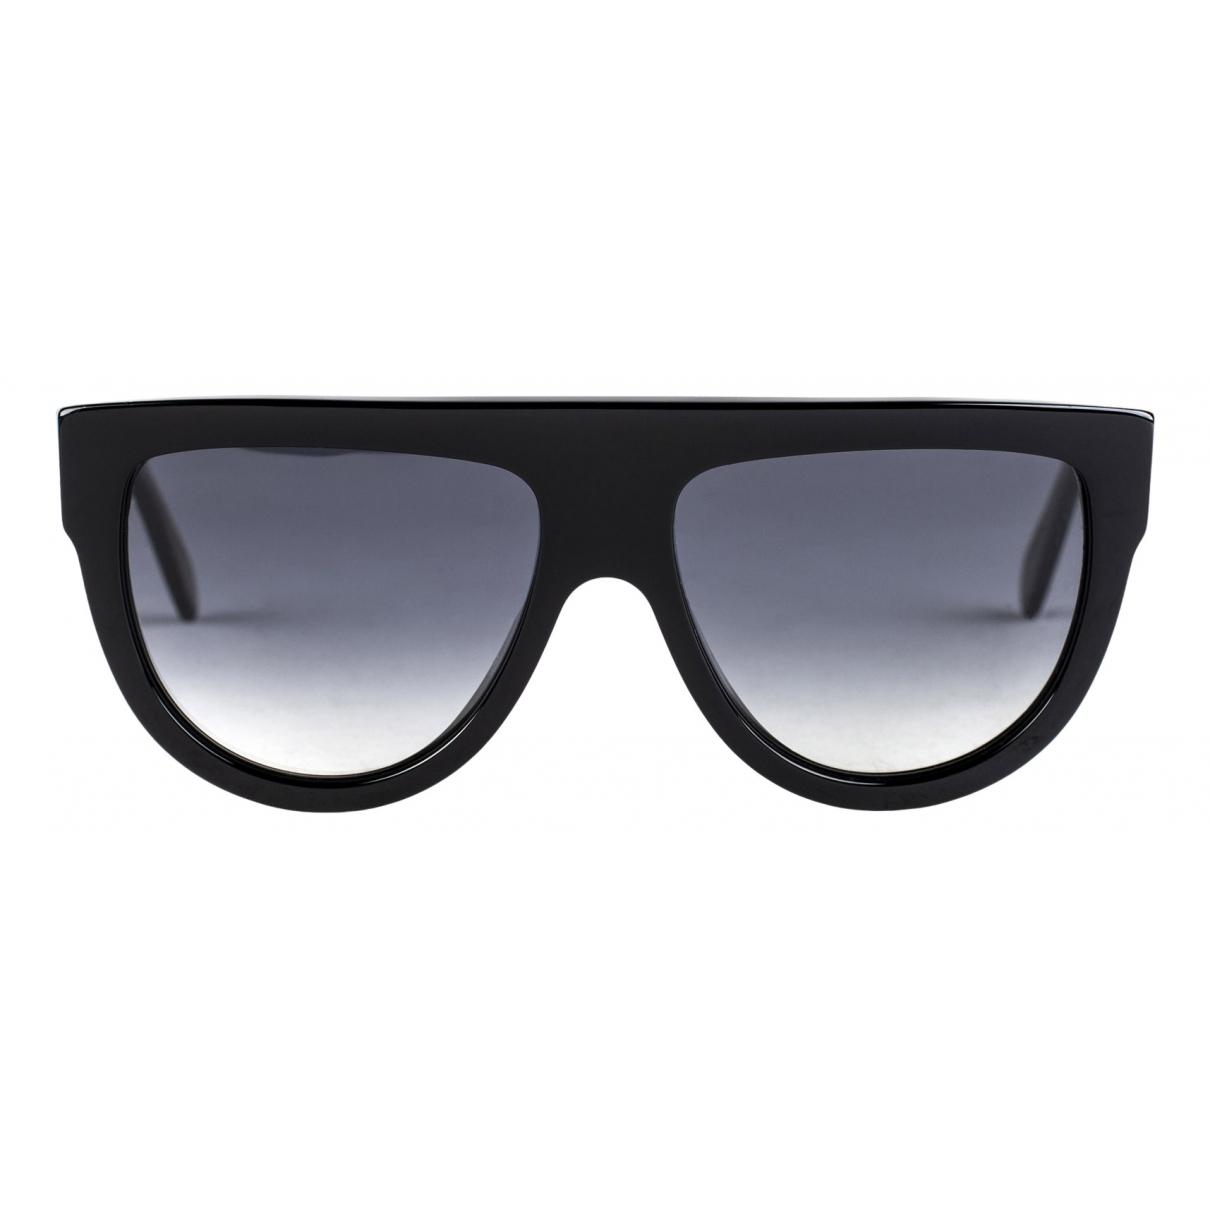 Gafas Celine